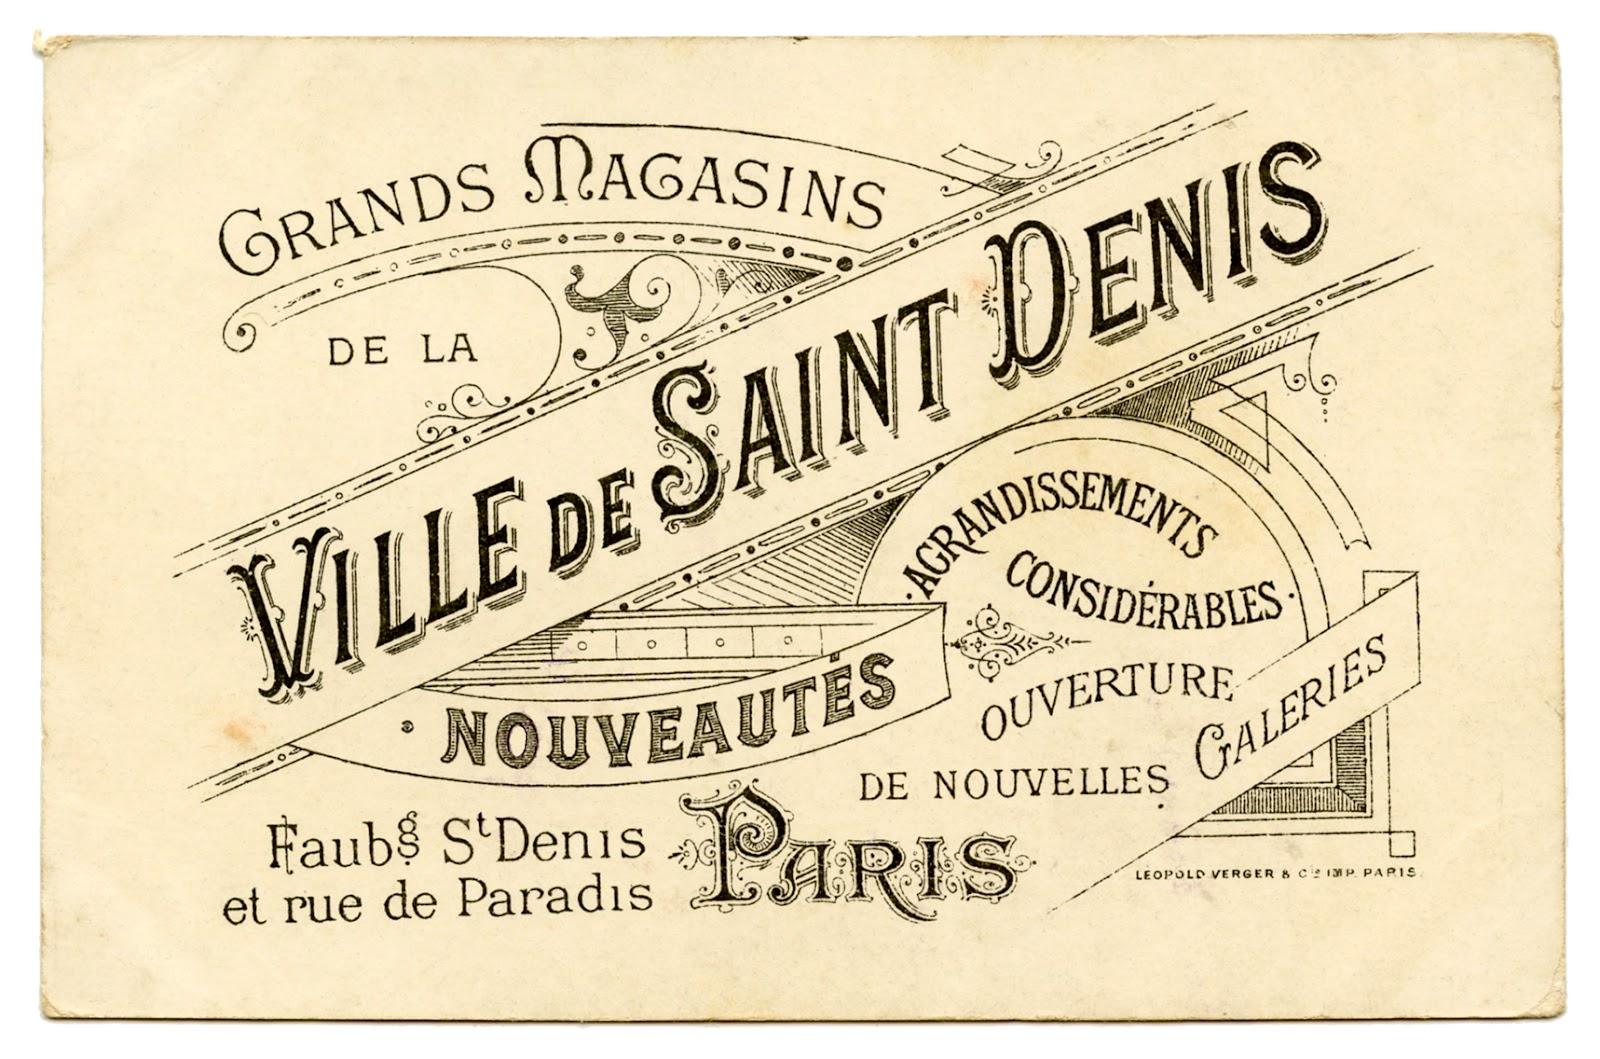 Vintage French Graphic Amazing Paris Ephemera The